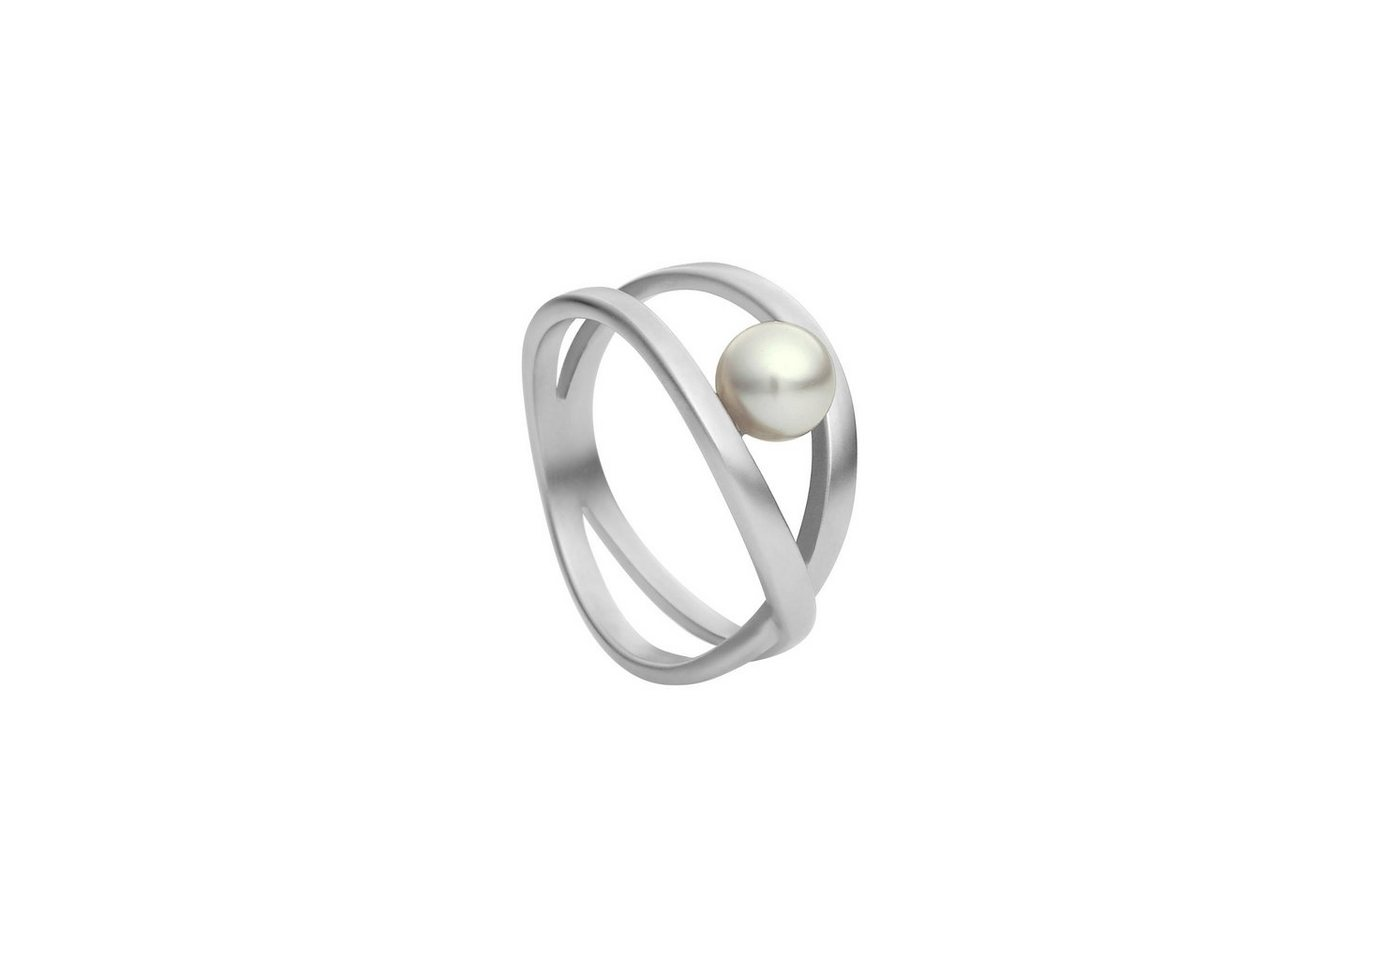 Heideman Perlenring »Facilis Glanzmatt« Damenring mit Swarovski Perle   Schmuck > Ringe > Perlenringe   Grau   Heideman